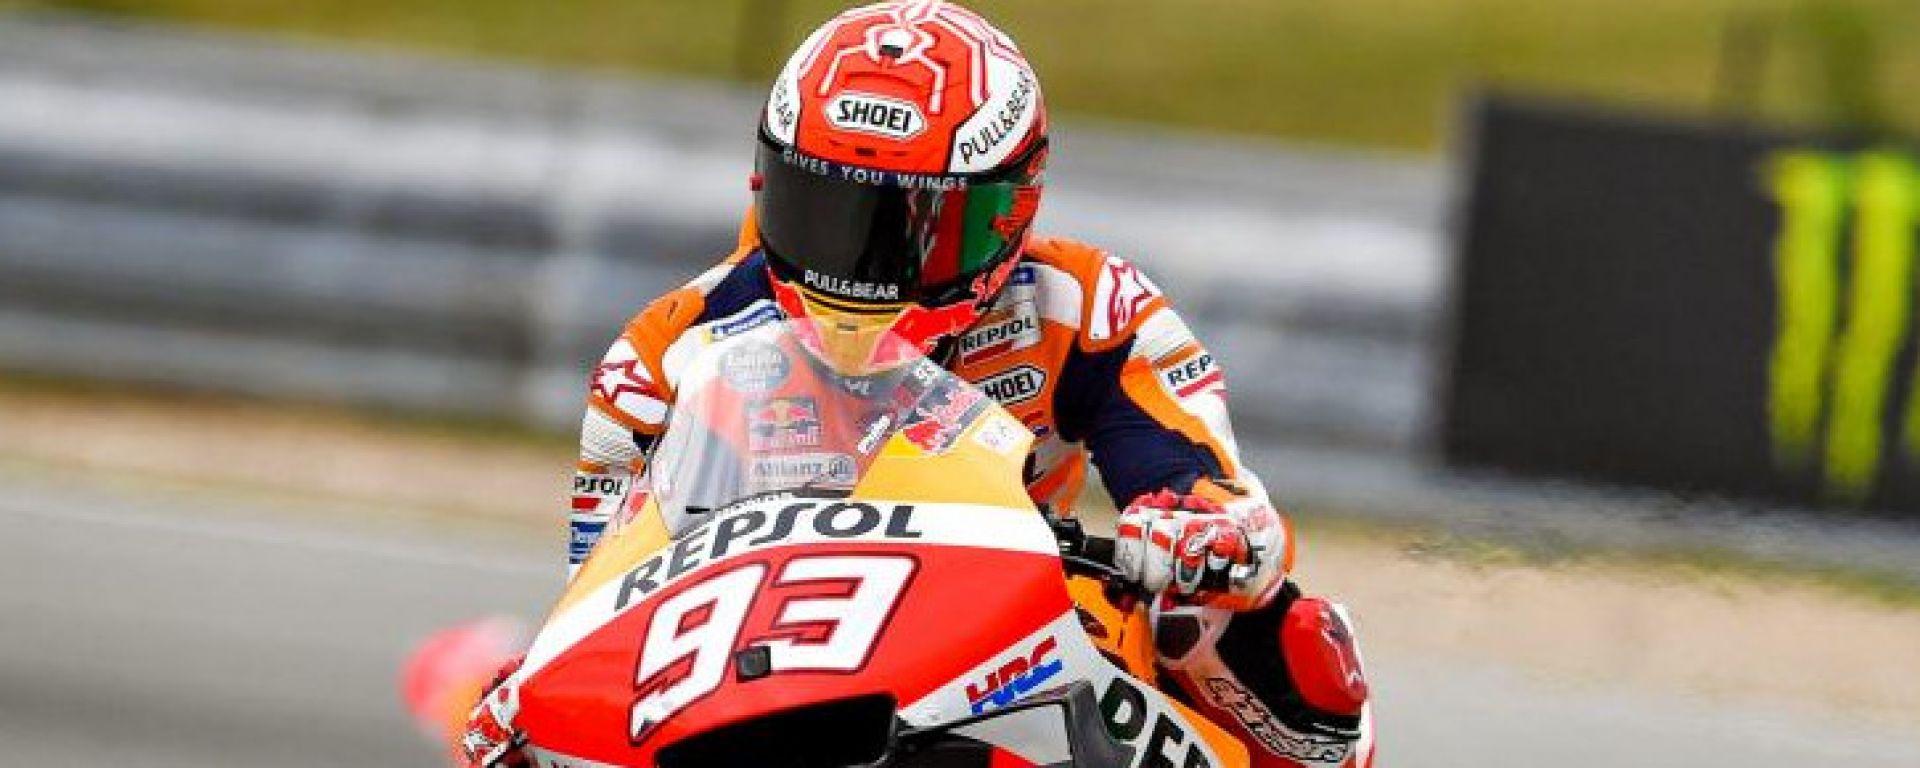 MotoGP Rep.Ceca, gara: stravince Marquez, Dovizioso 2°